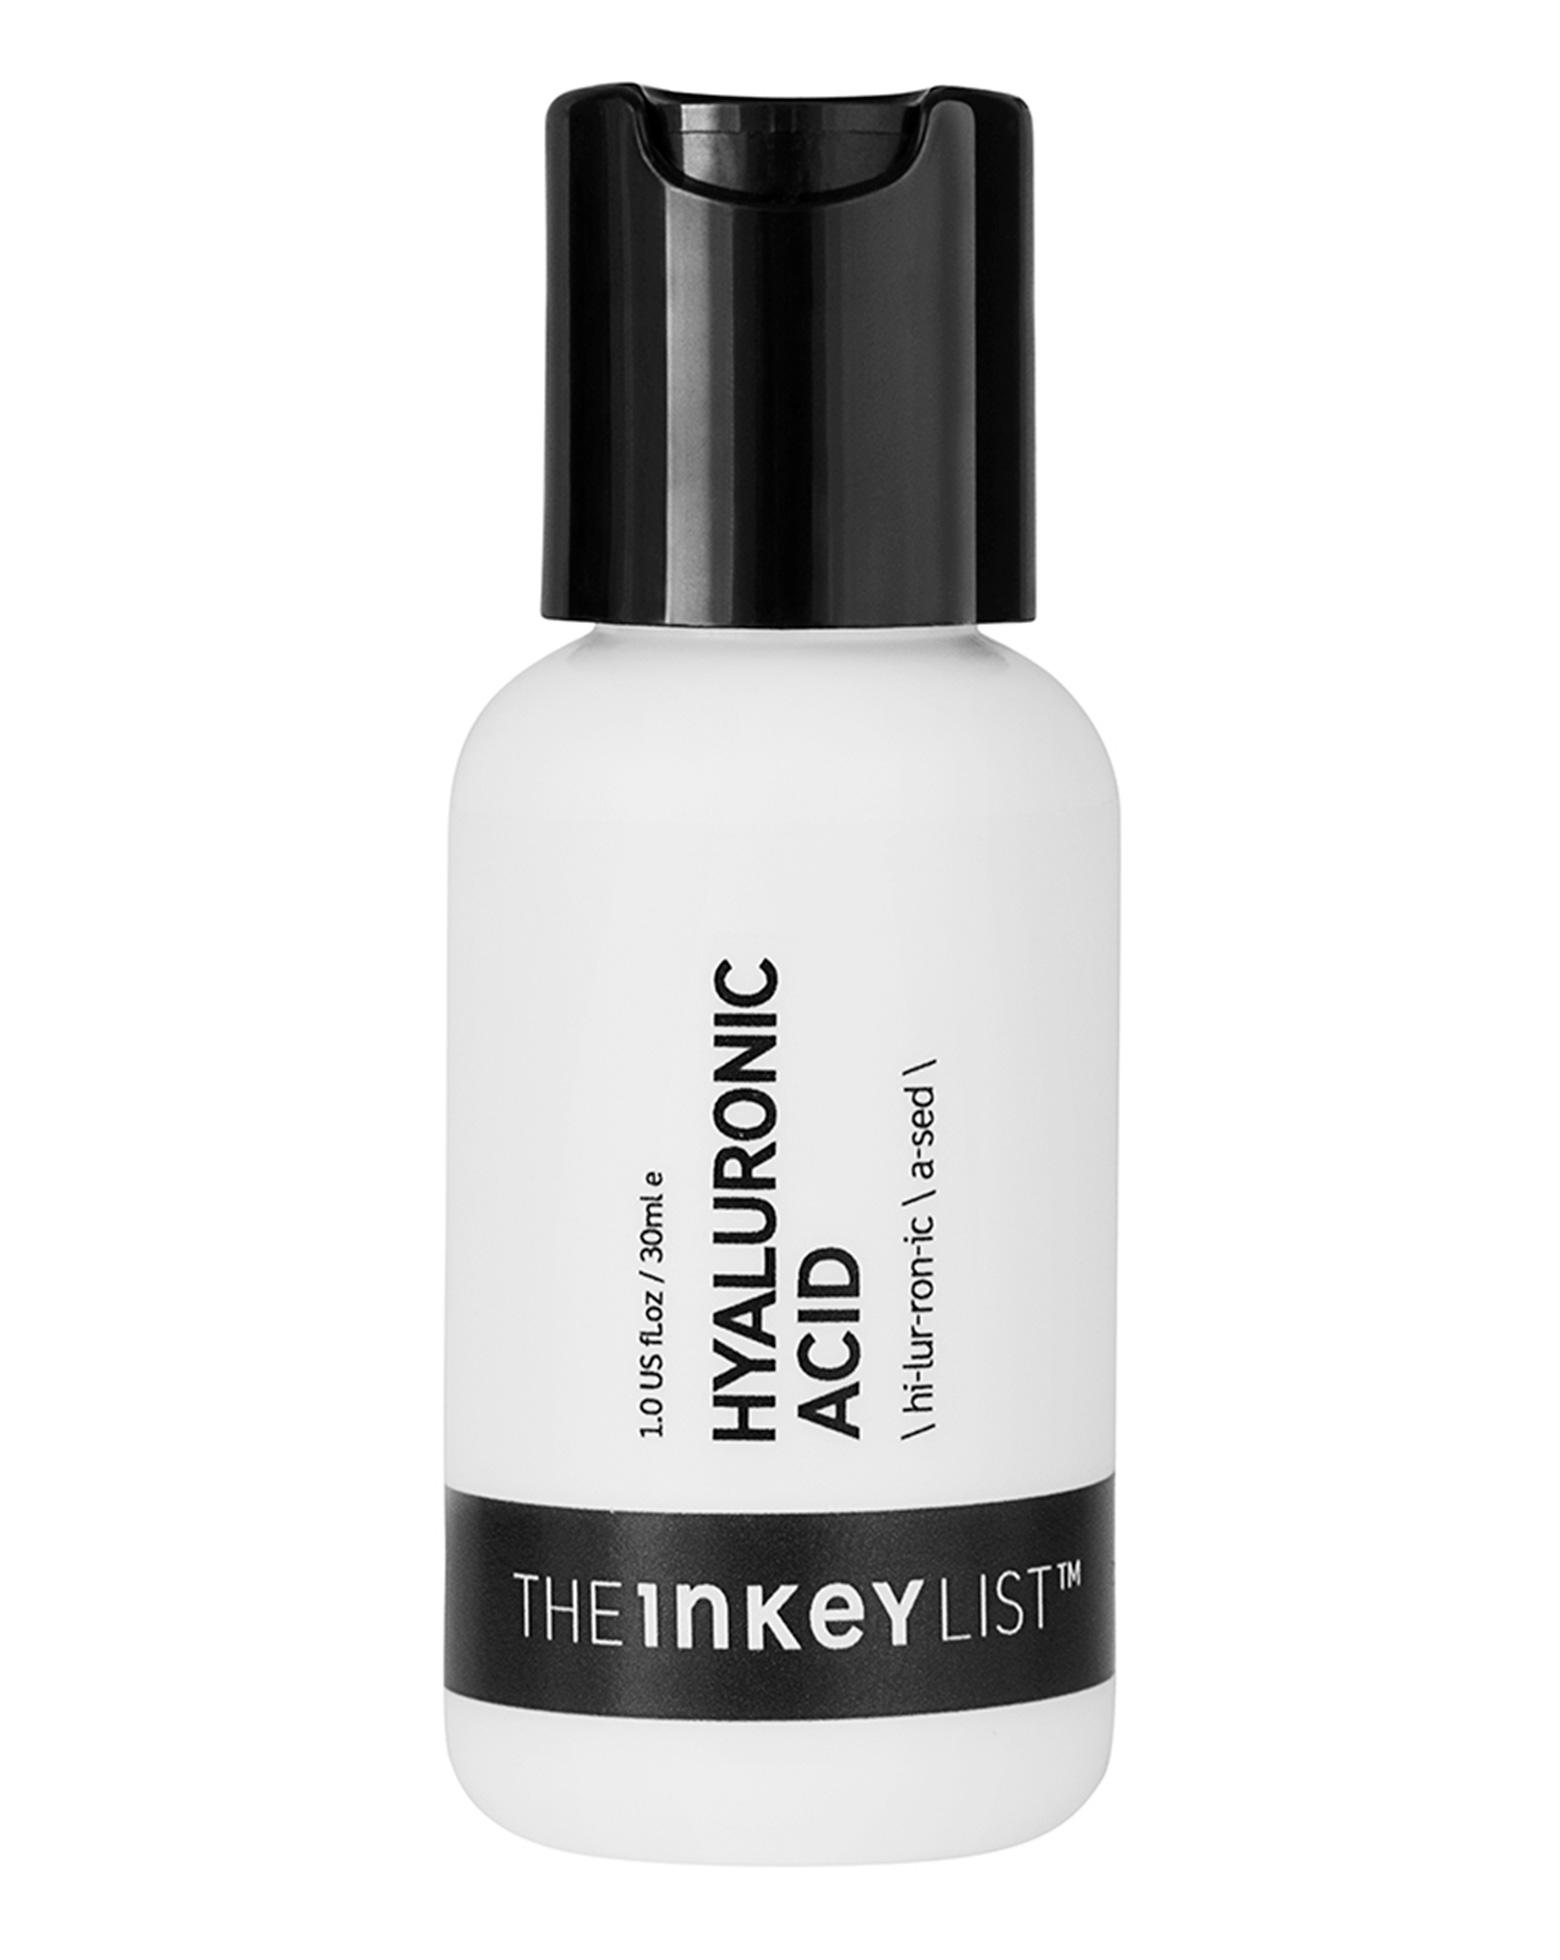 The Inkey List - Hyaluronic Acid Serum